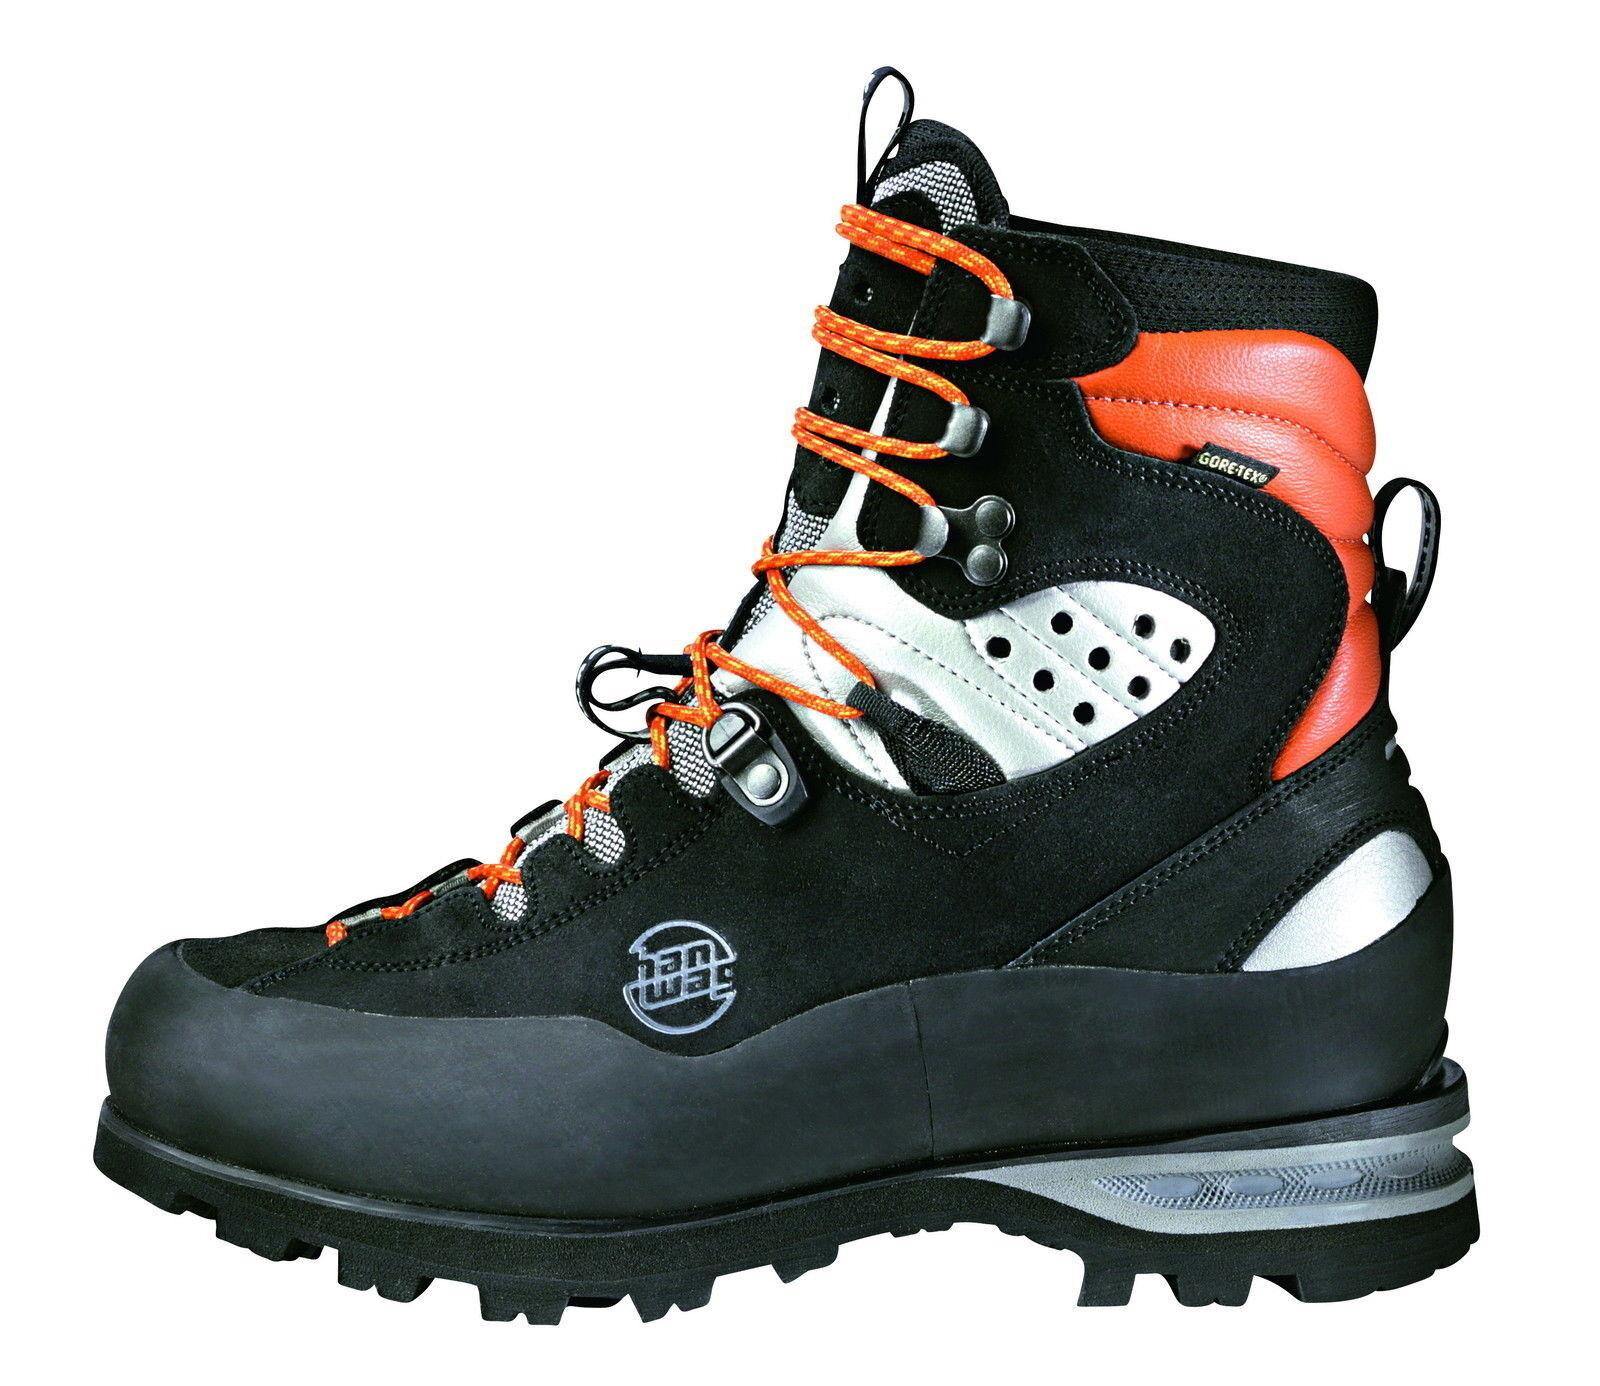 Hanwag Grado de Escalada botas  de Montaña Friction GTX Talla 12-47 Negro  suministramos lo mejor